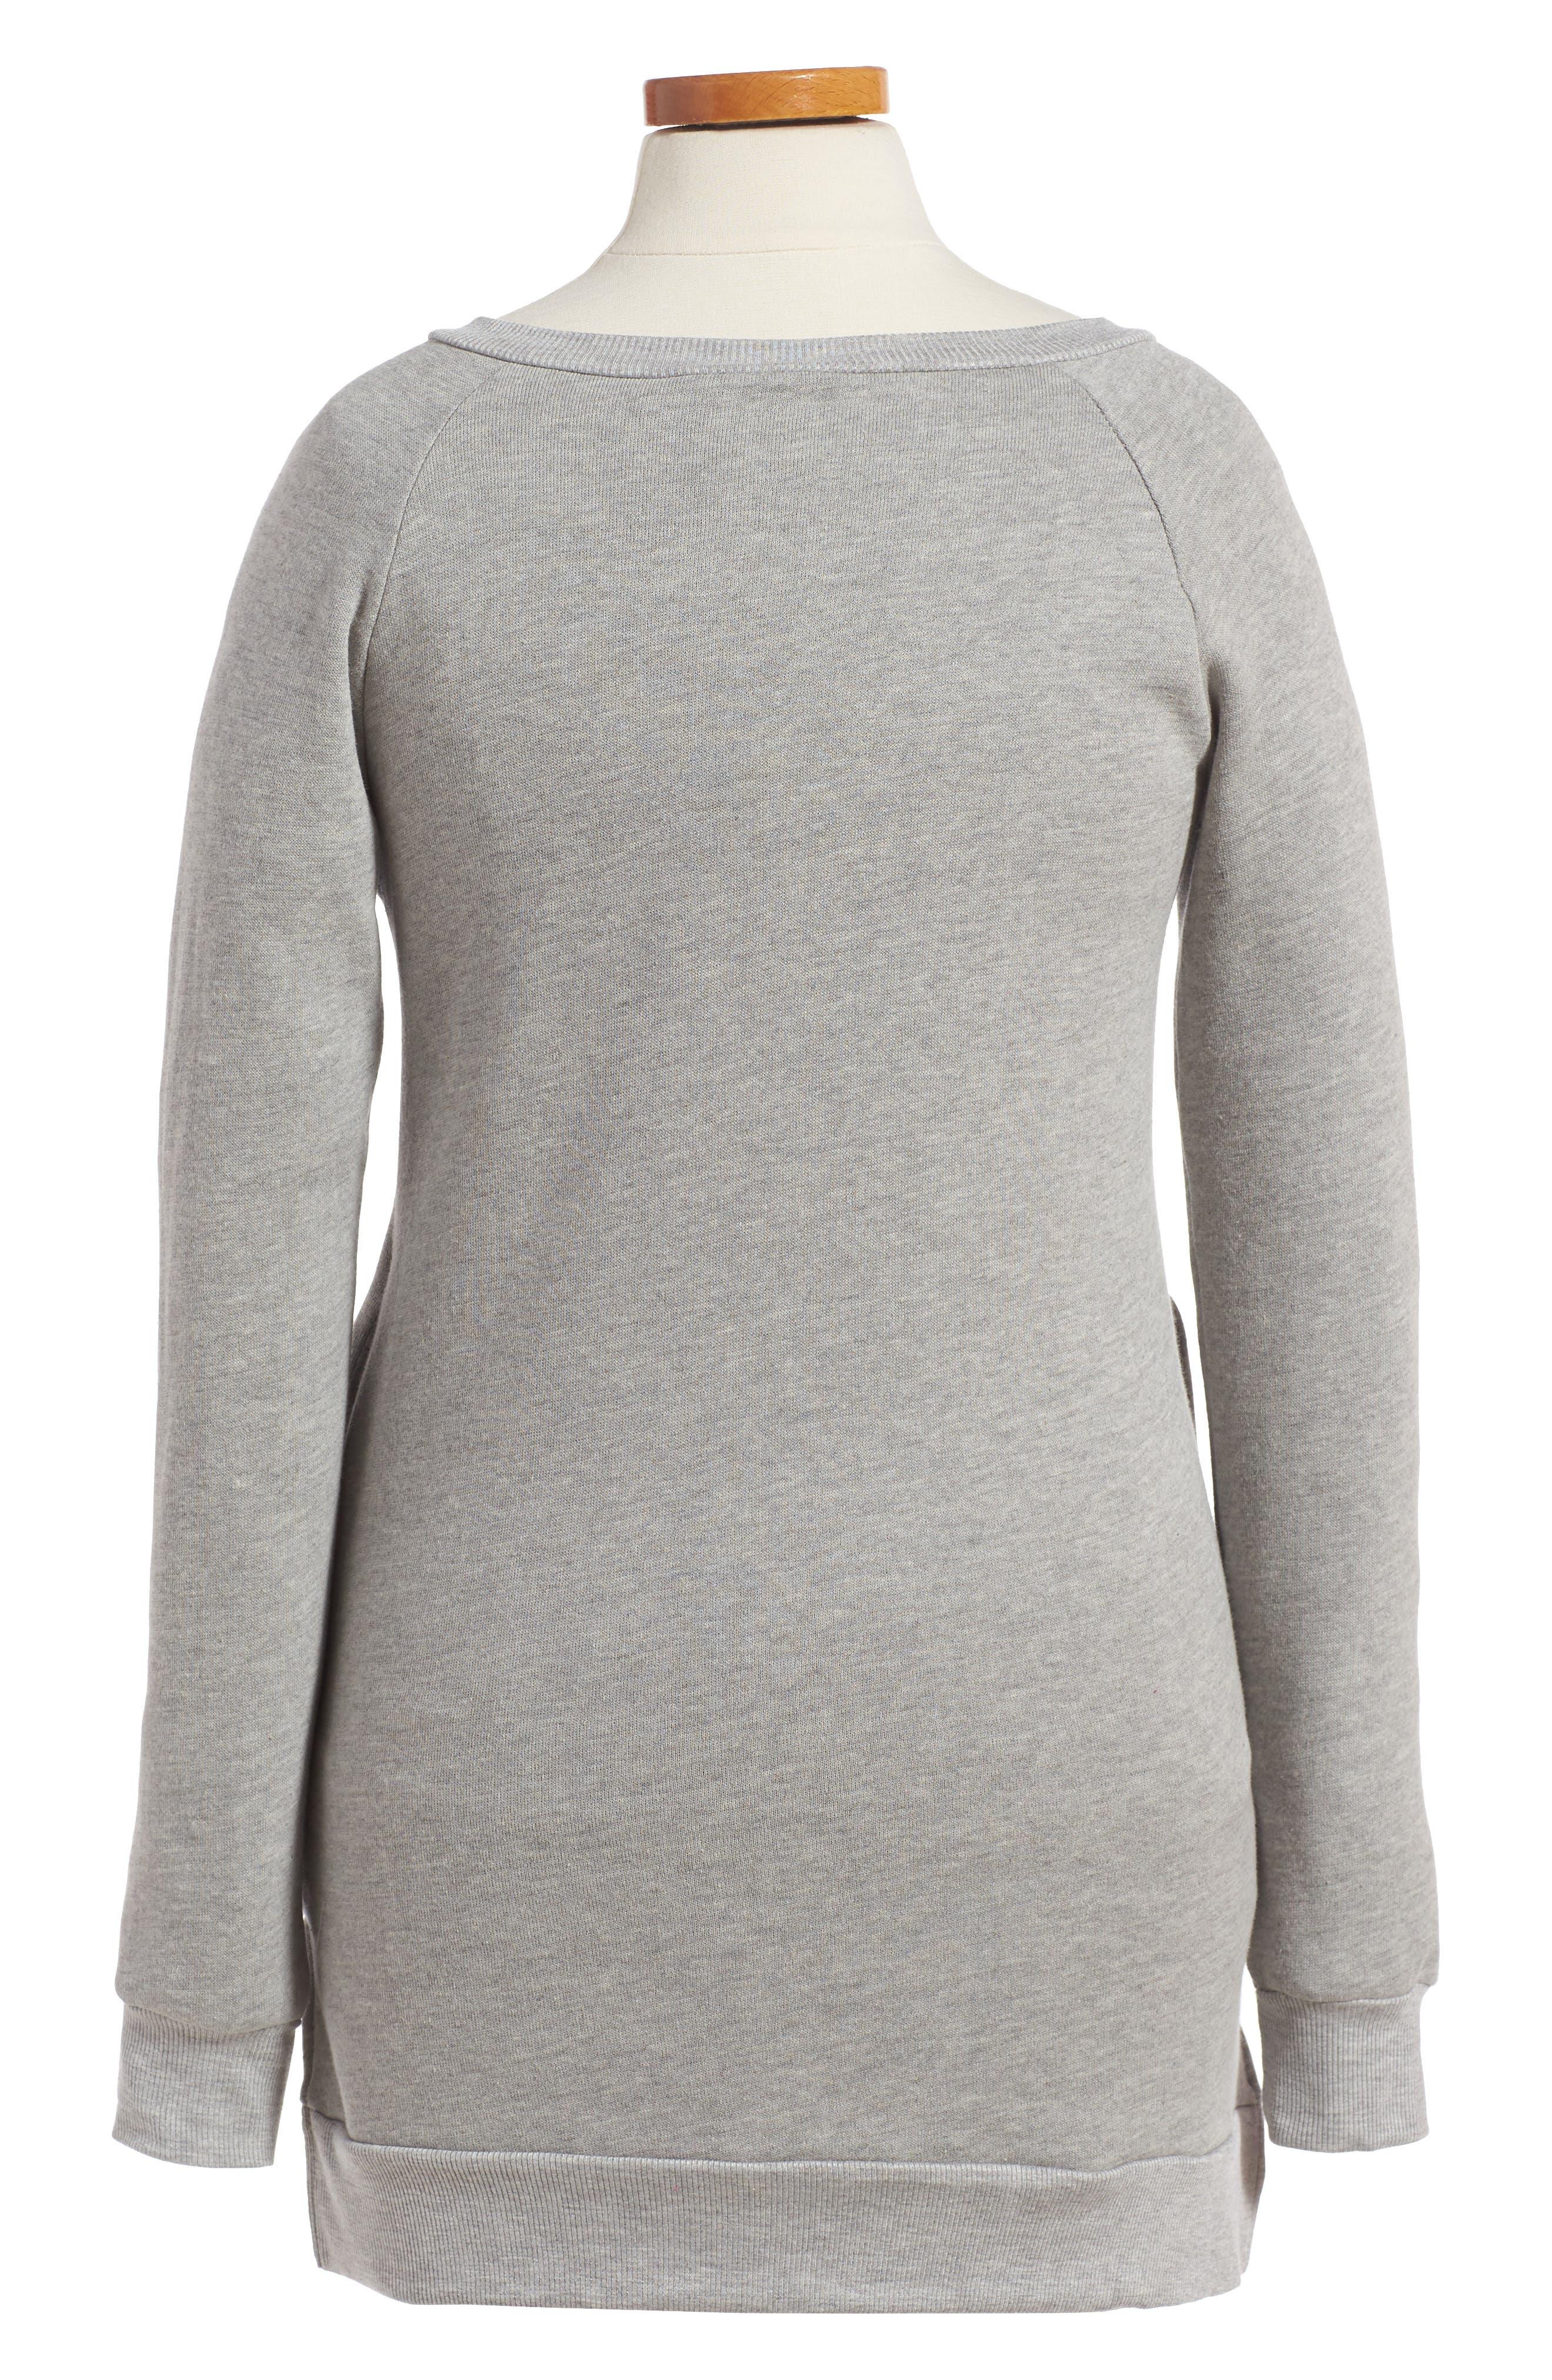 Alternate Image 2  - PPLA Dreamer Appliqué Sweatshirt Dress (Big Girls)